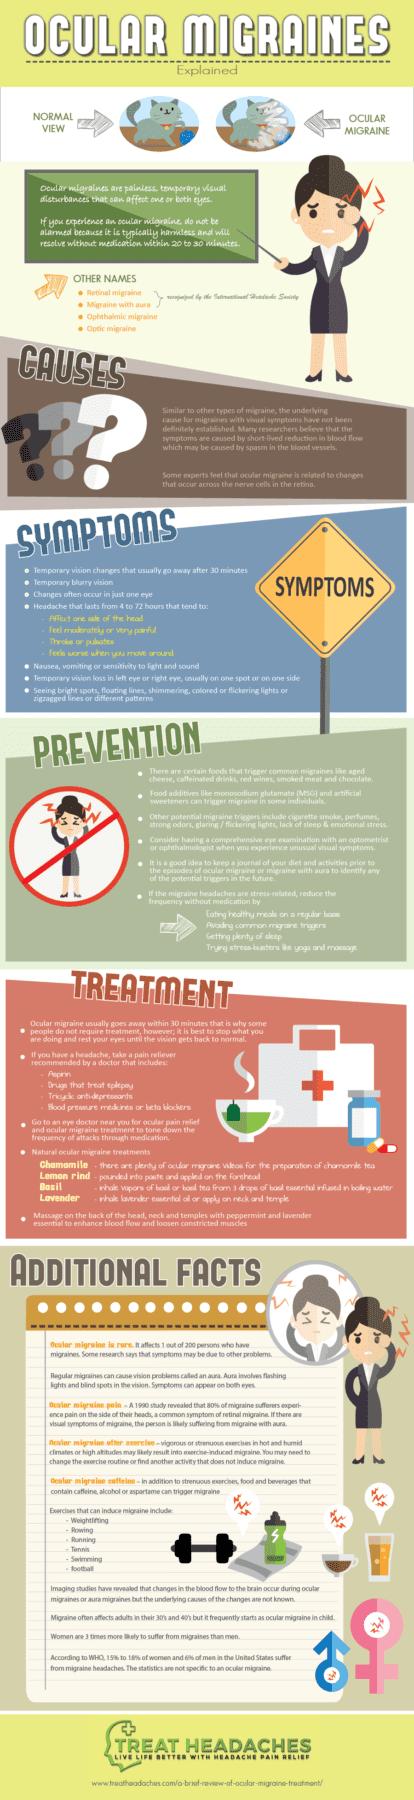 causes symptoms prevention treatment